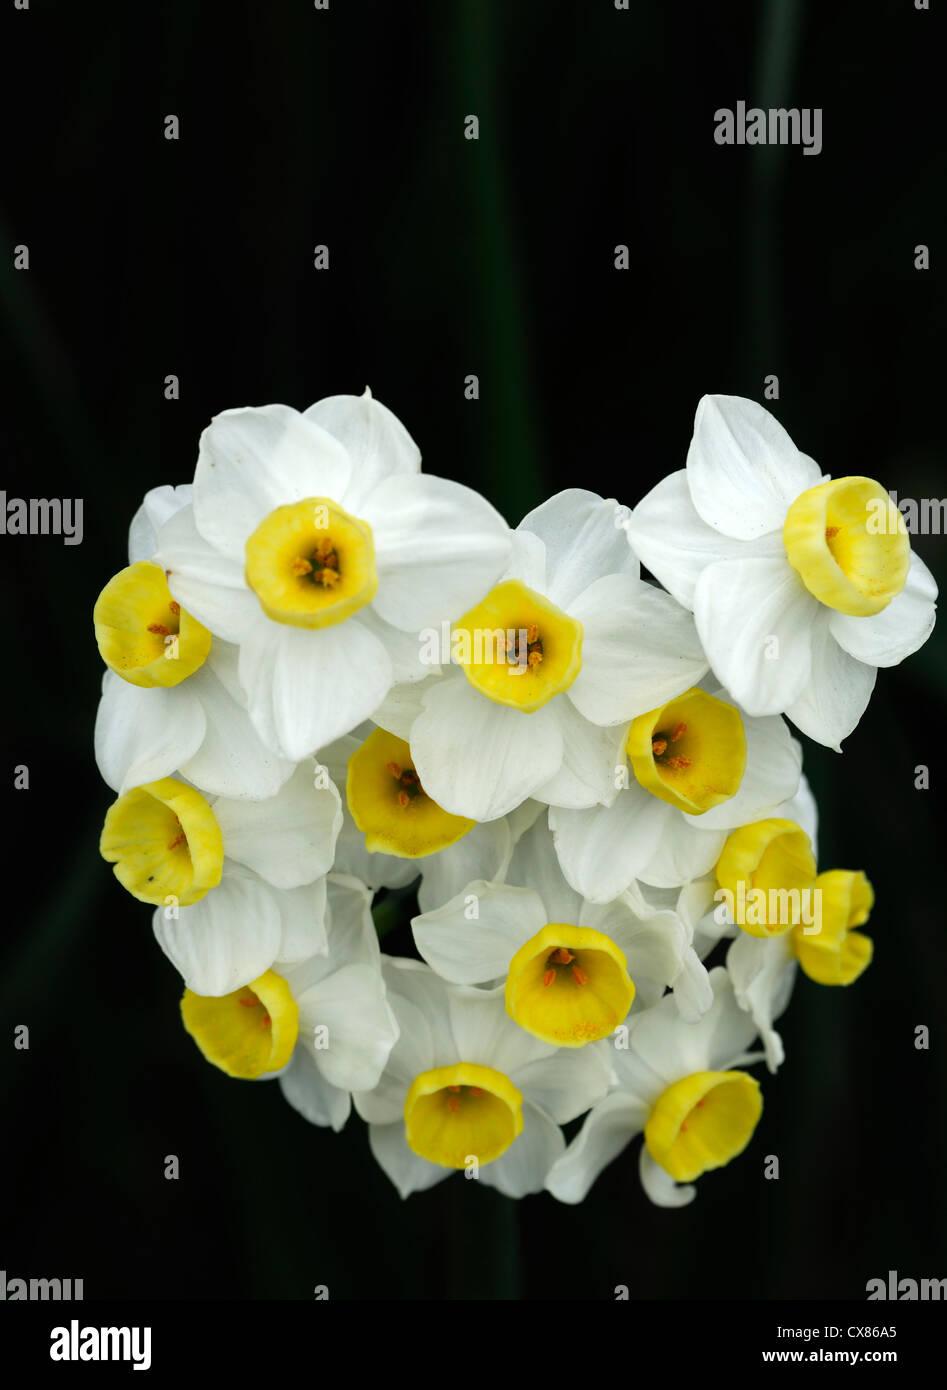 Narcissus Geranium Tazetta Multi Head White Daffodil Yellow Flower